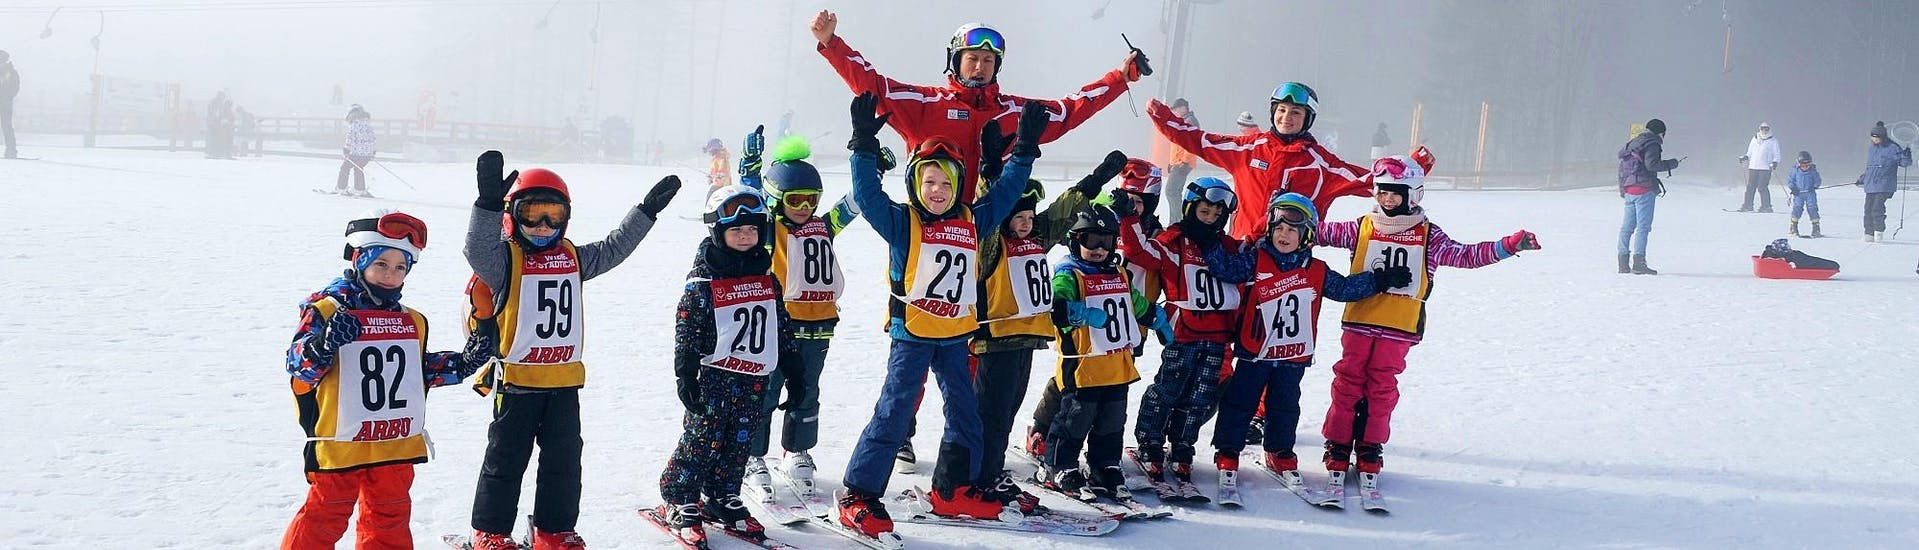 kids-ski-lessons-5-17-y-for-all-levels-half-day-skischule-semmering-hero